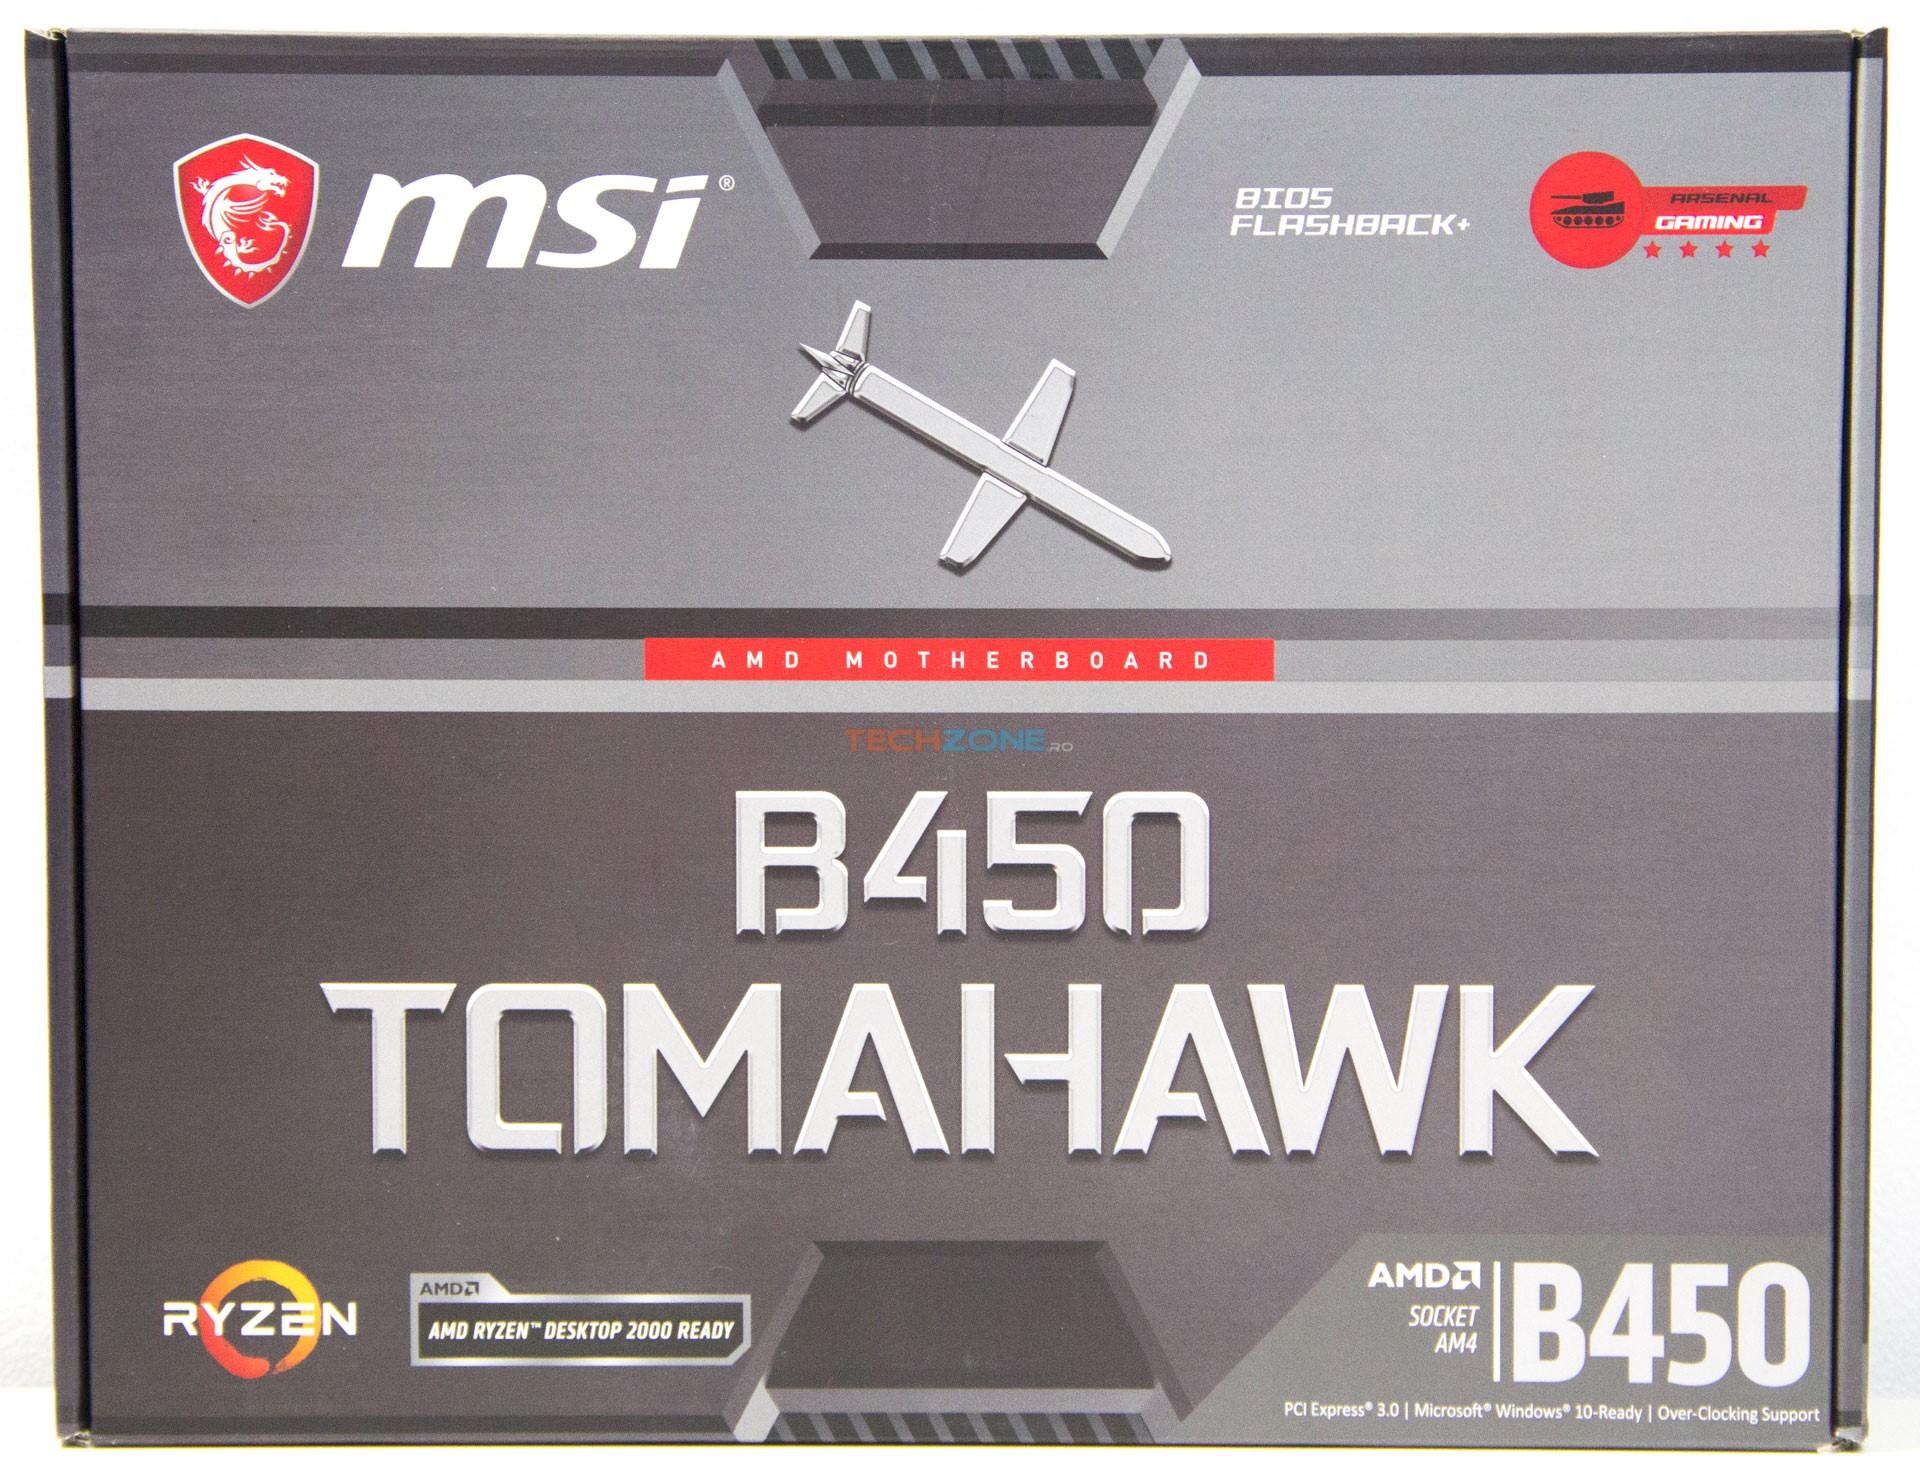 MSI B450 Tomahawk box